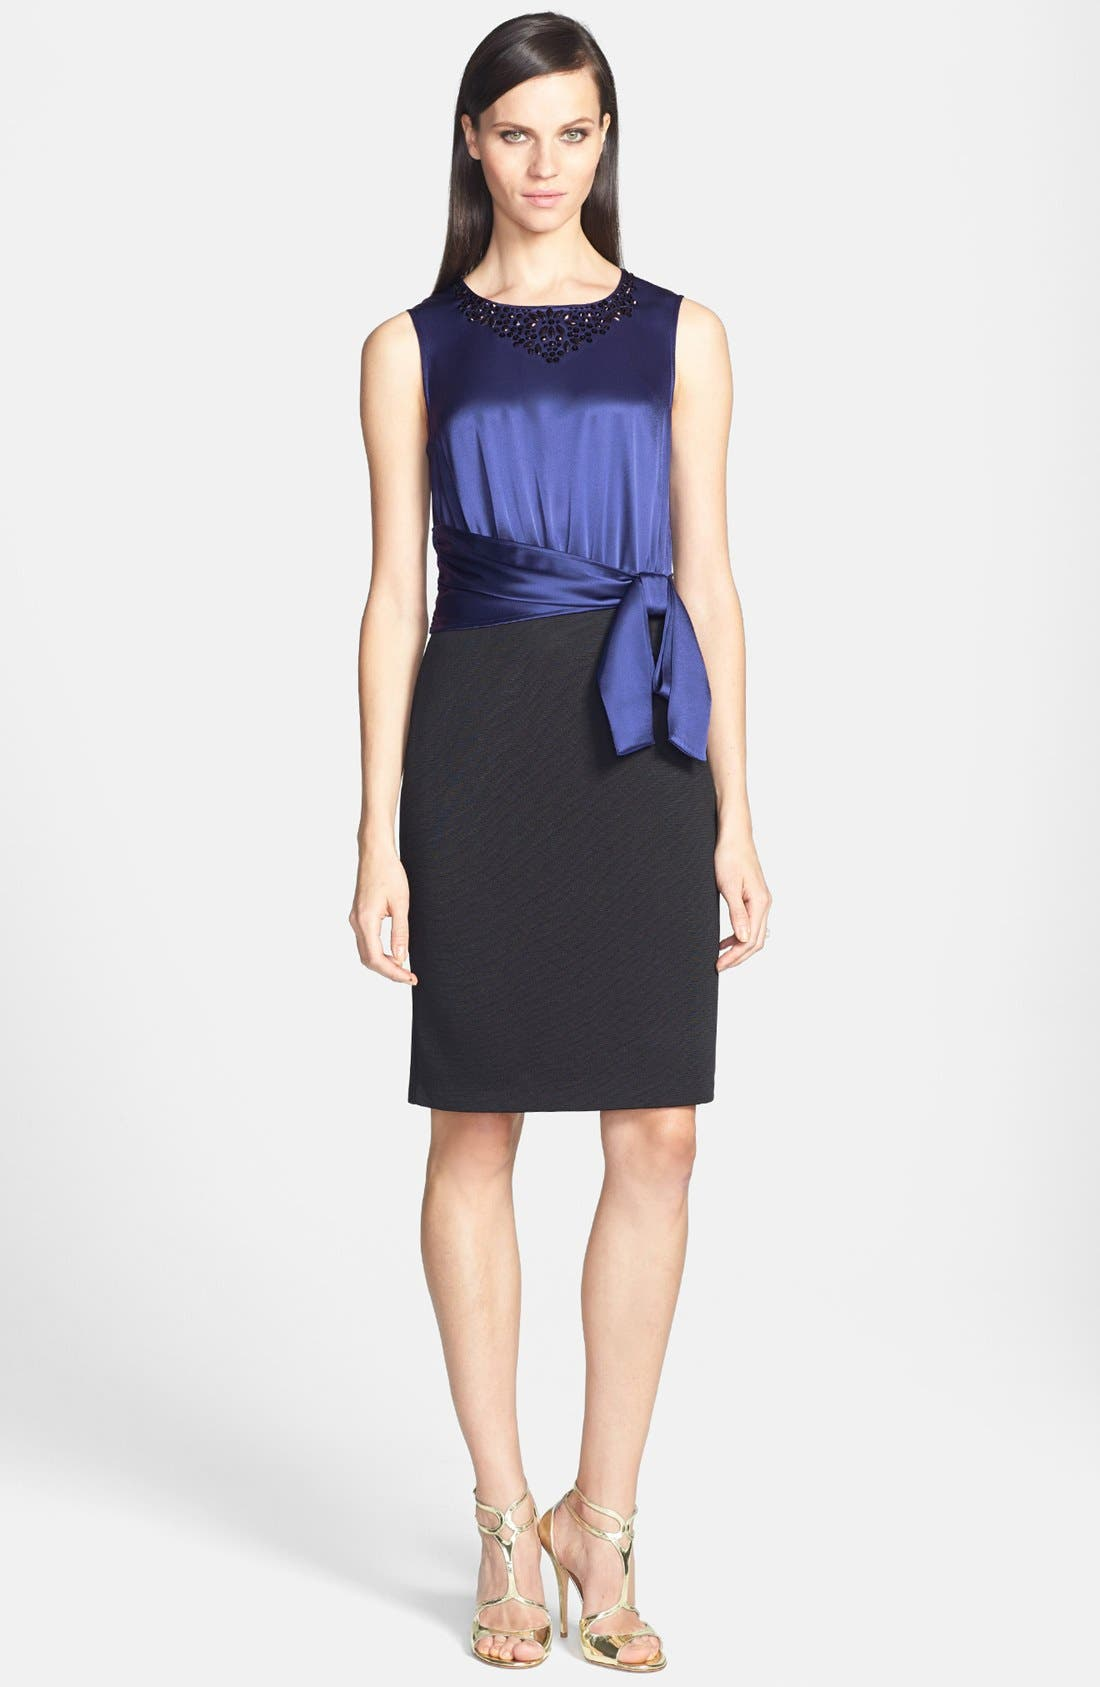 Alternate Image 1 Selected - St. John Collection Embellished Liquid Satin & Milano Knit Dress